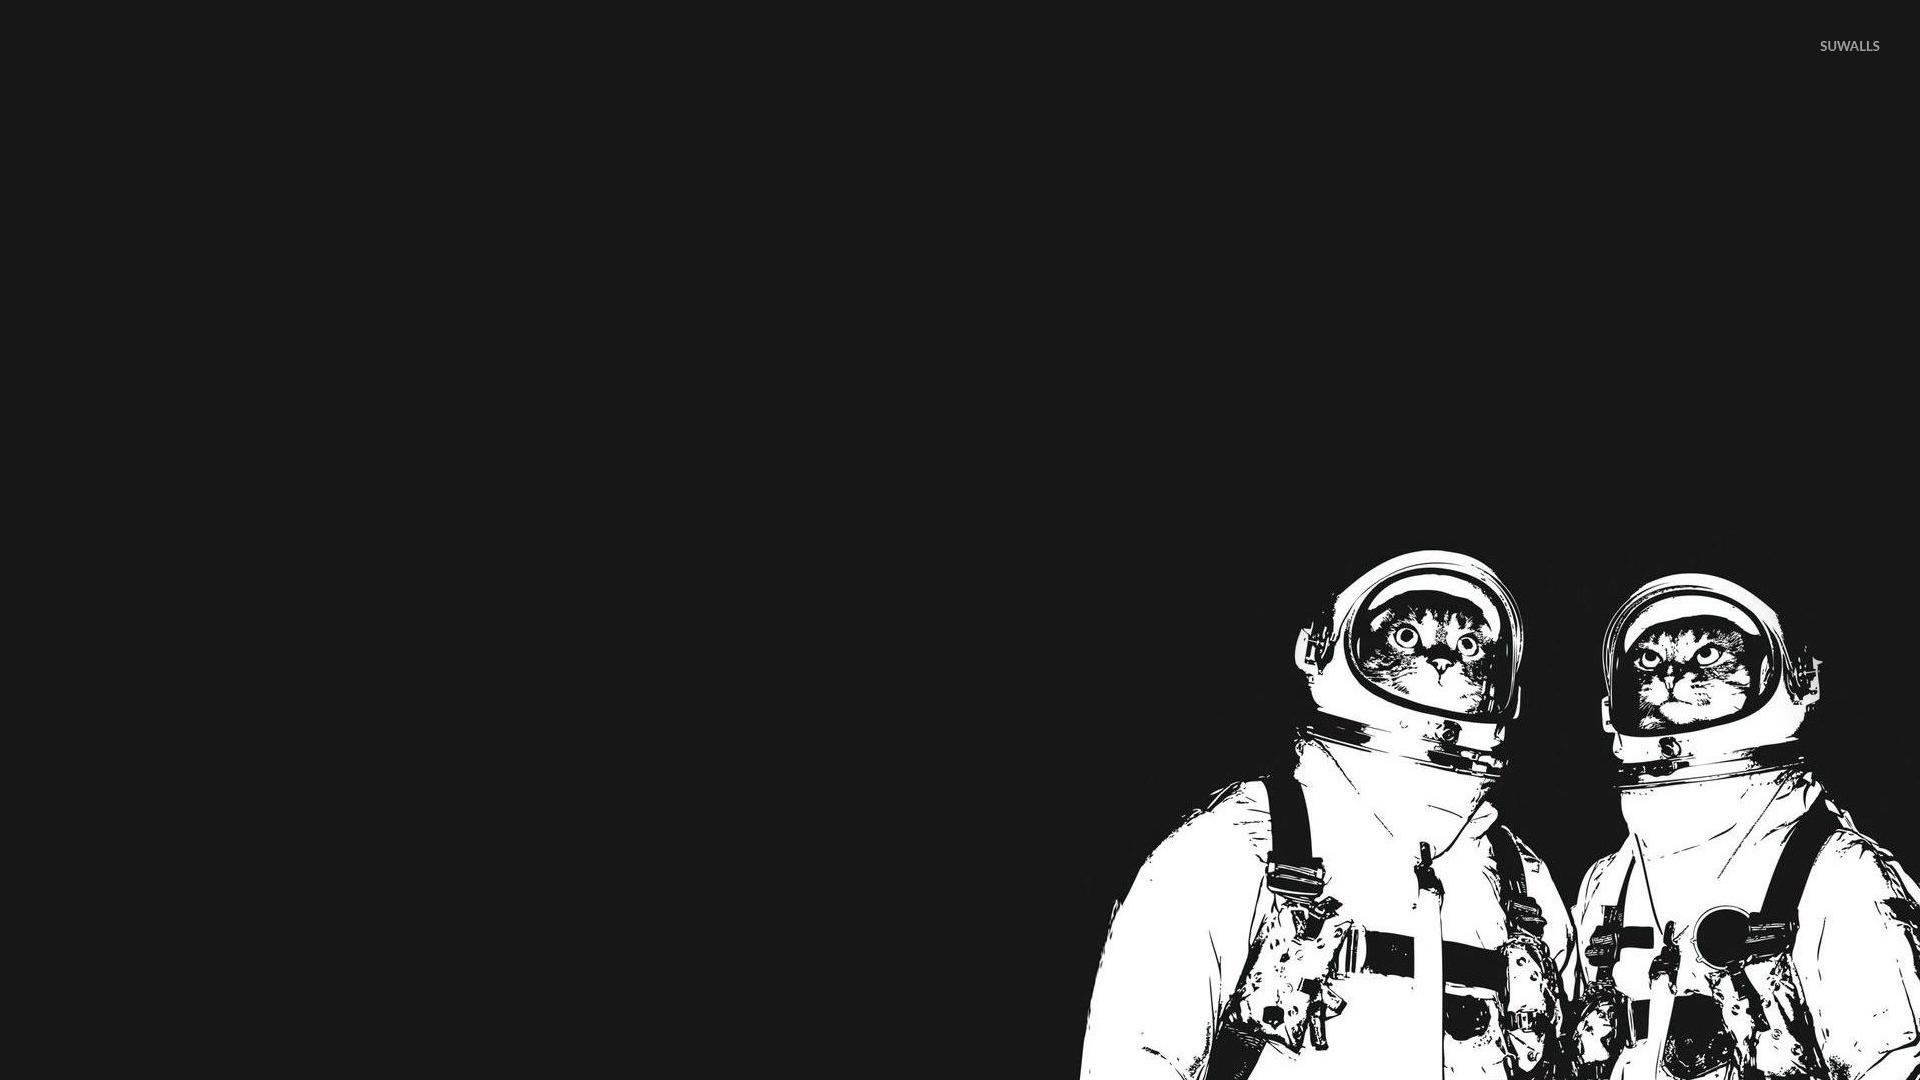 Cat astronauts wallpaper   Funny wallpapers   14332 1920x1080